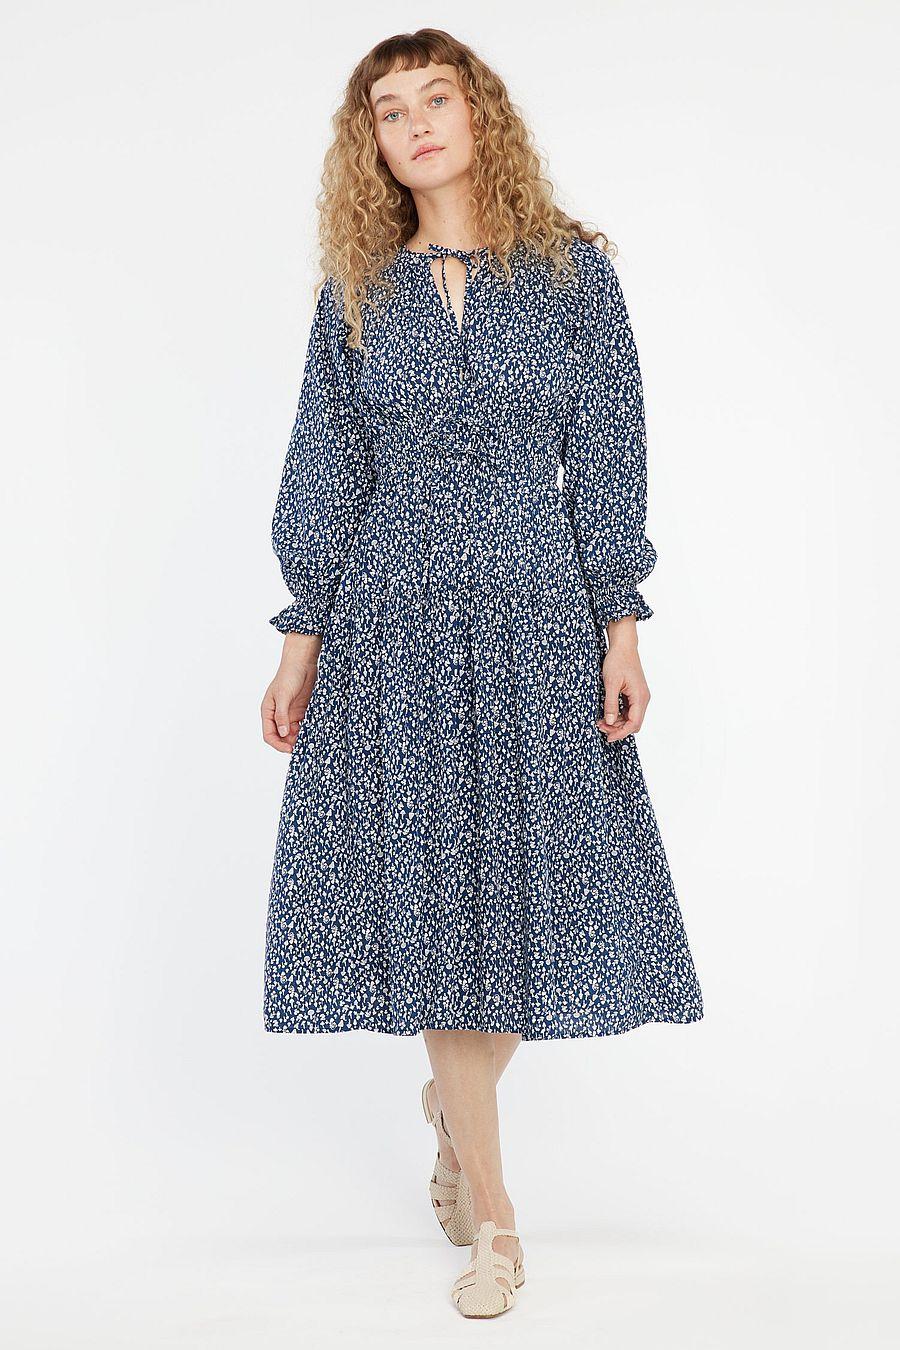 LACAUSA Clothing Dama Dress - Blue Magic Mushroom